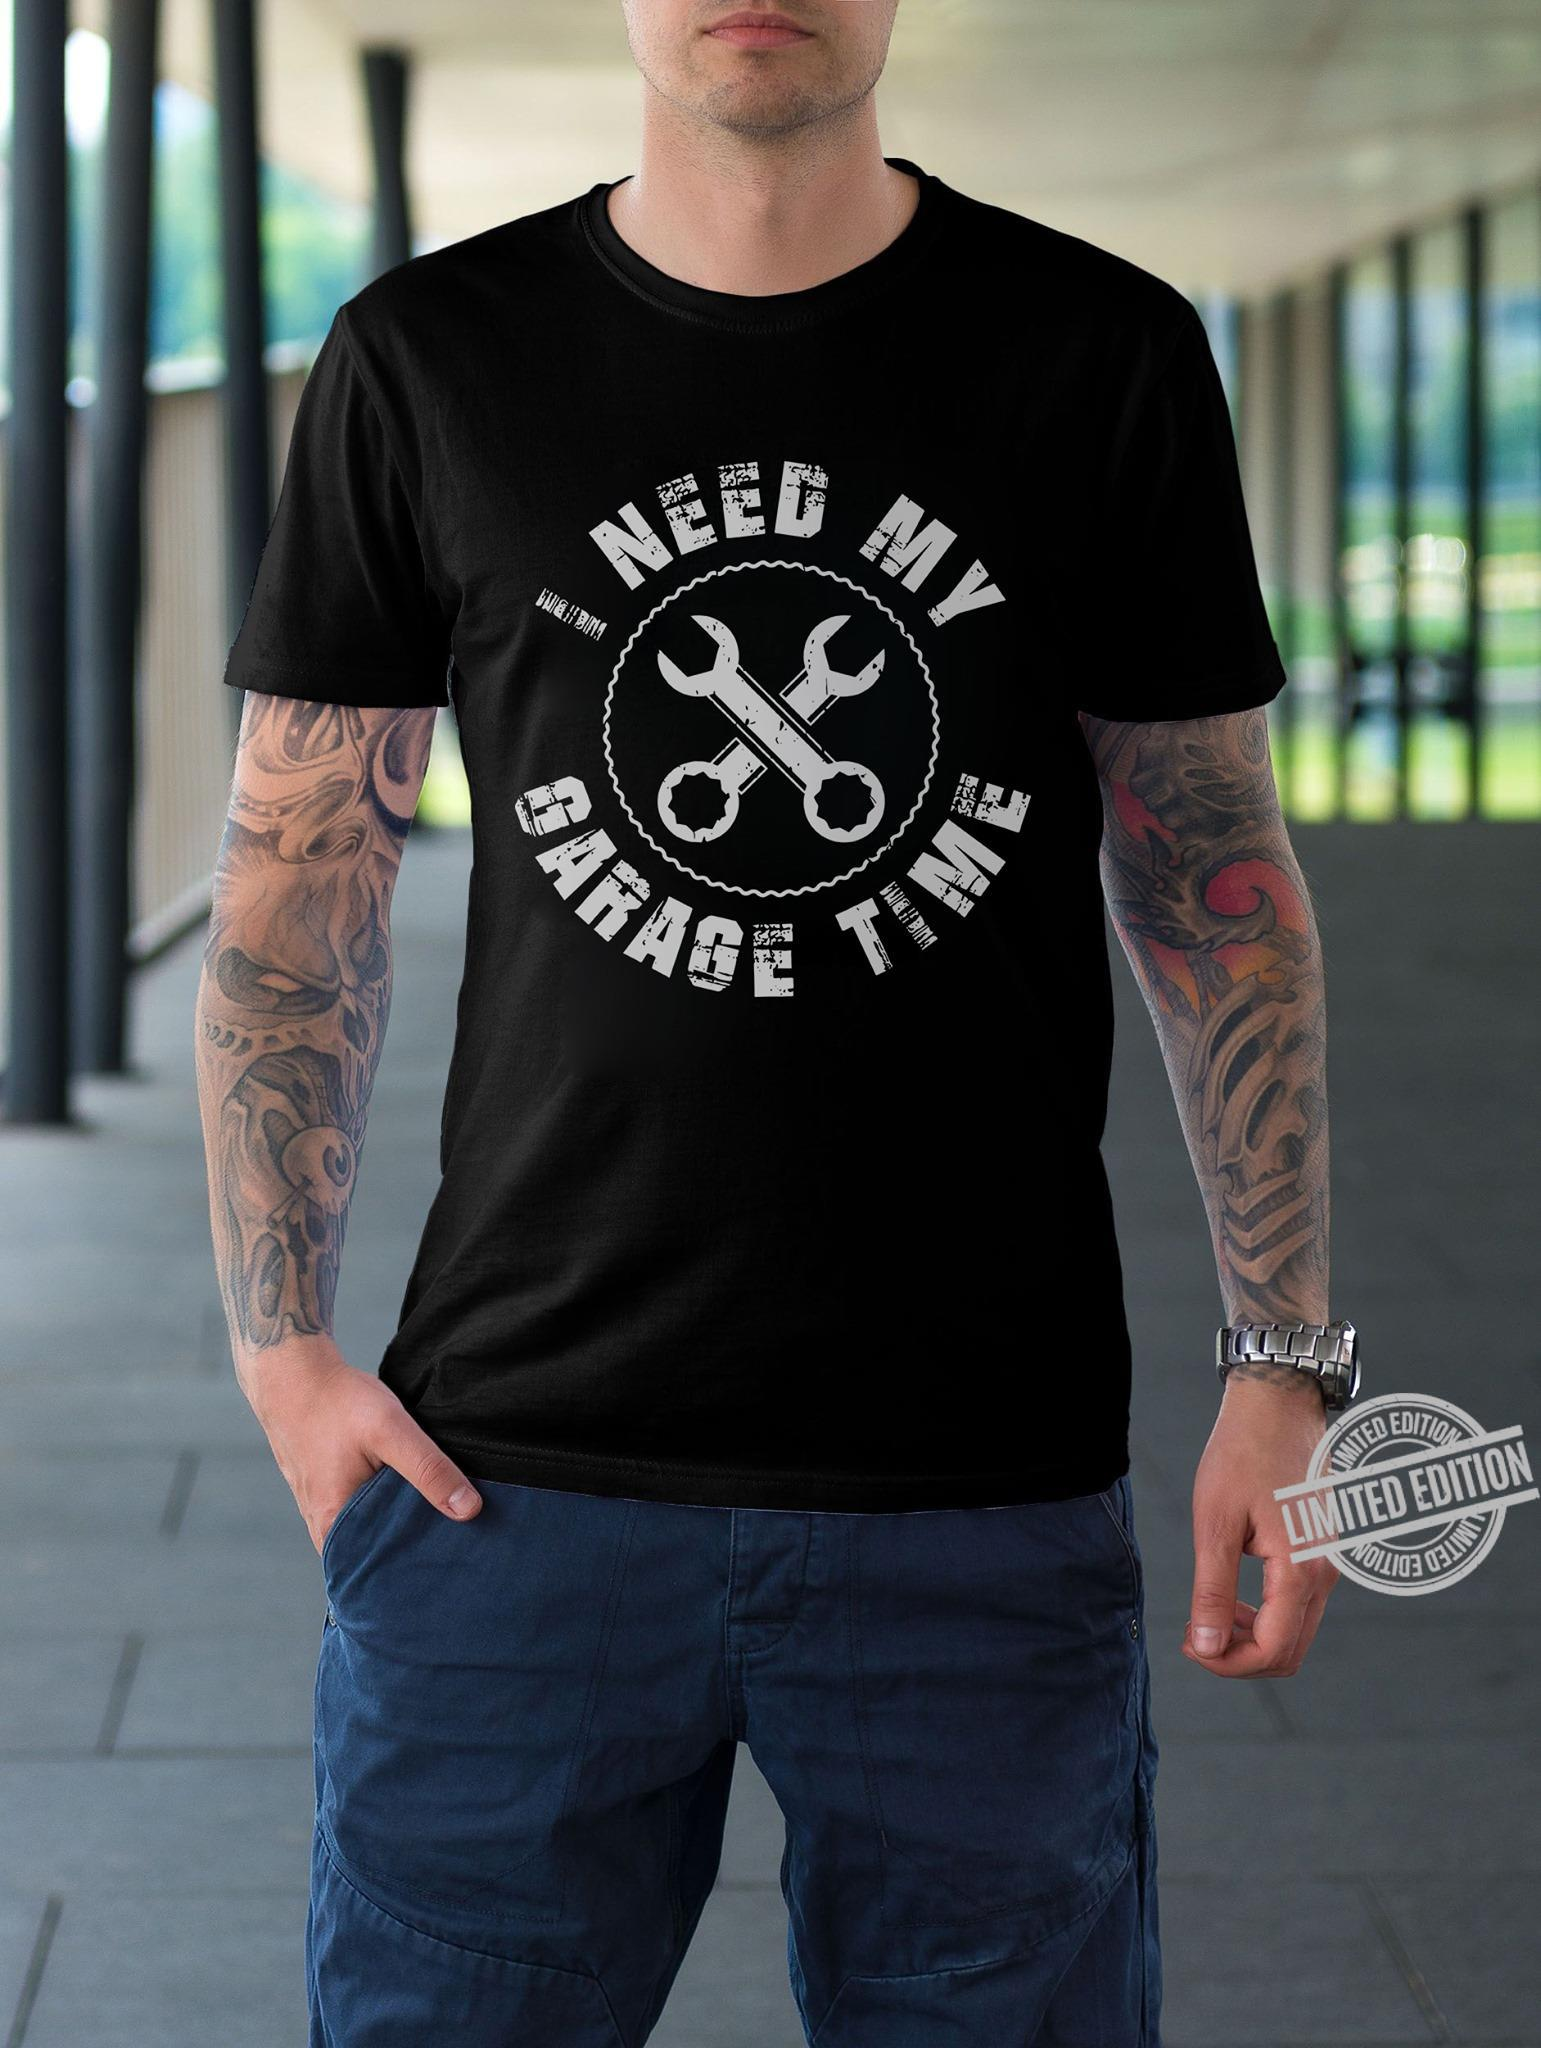 I Need My Garage Time Shirt